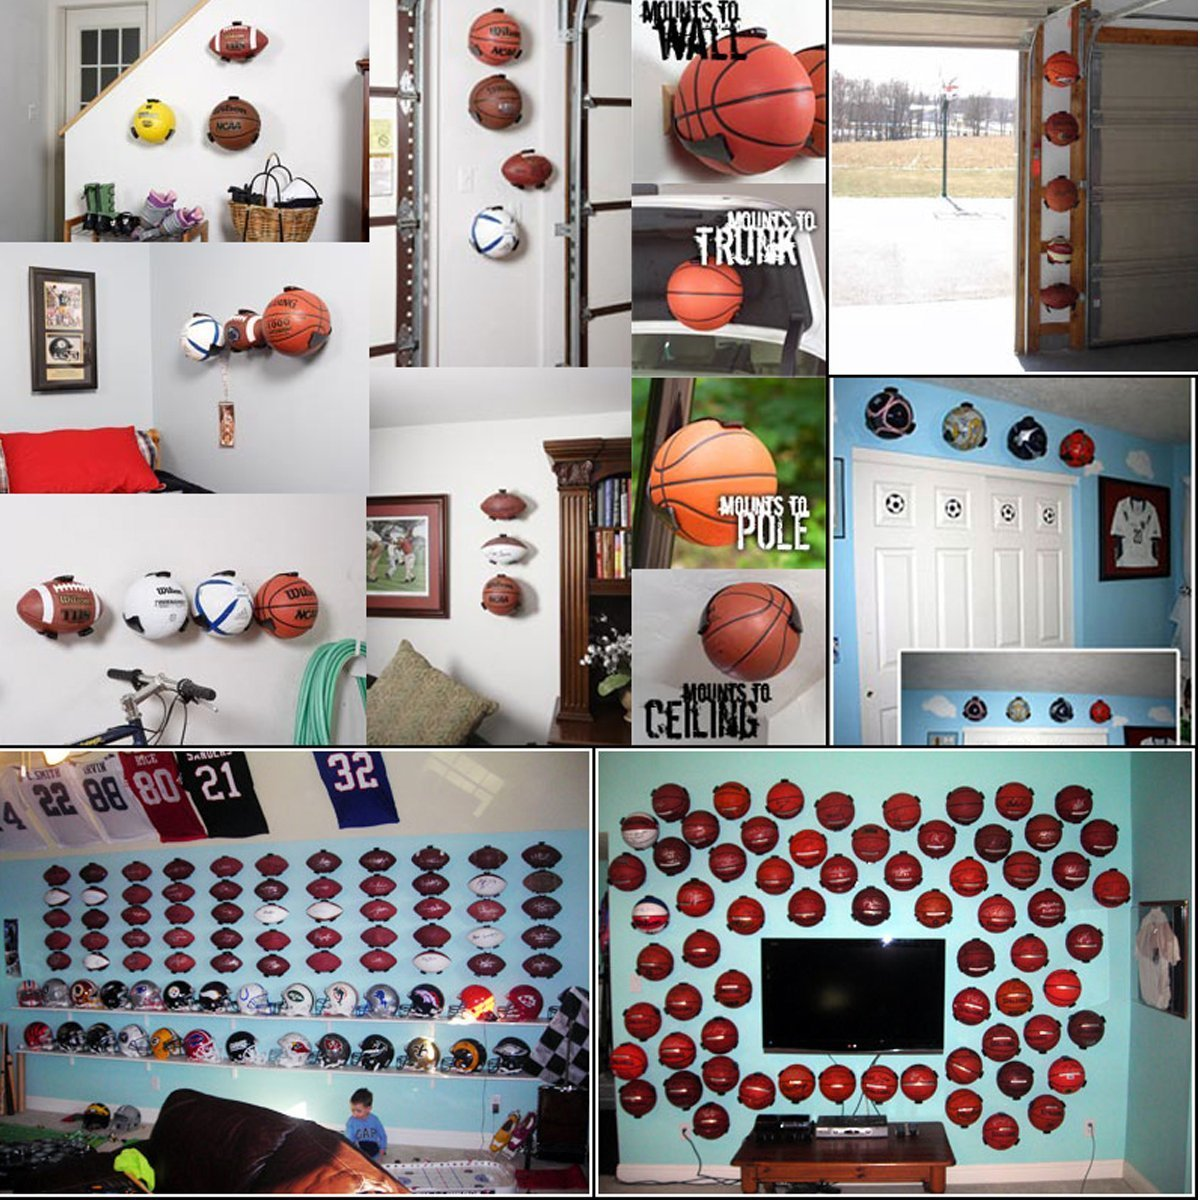 Ballhalter Ball Wandhalterung Sportball Claw Schau auf der Wand f/ür Basketball Fu/ßball Volleyball American Football Hand Claw